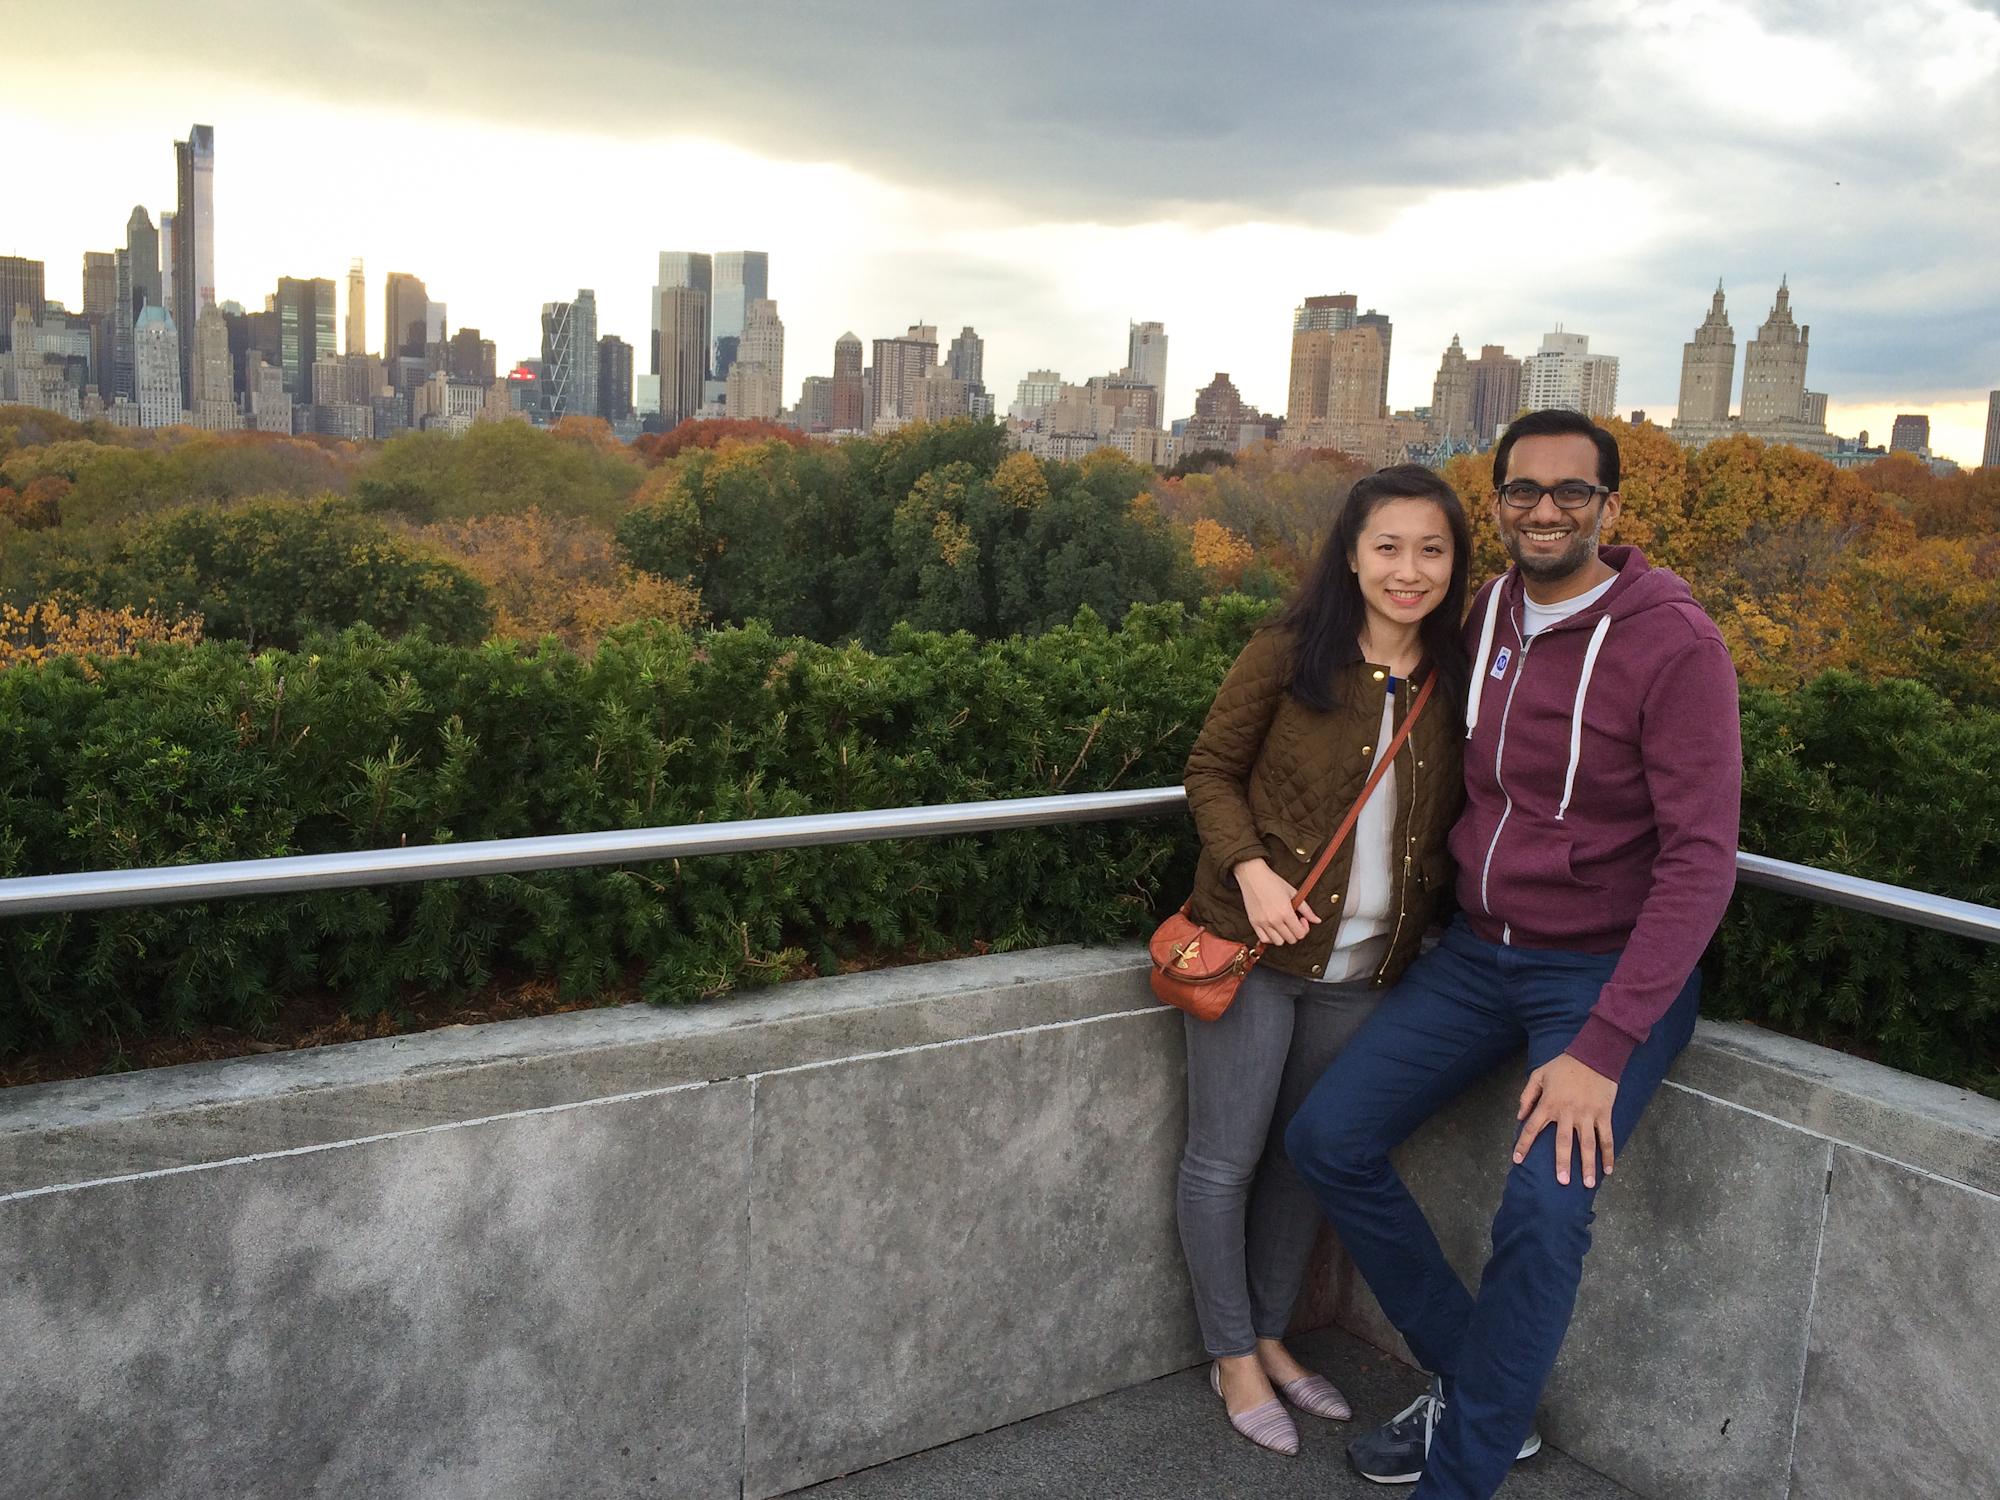 New York City, November 2013